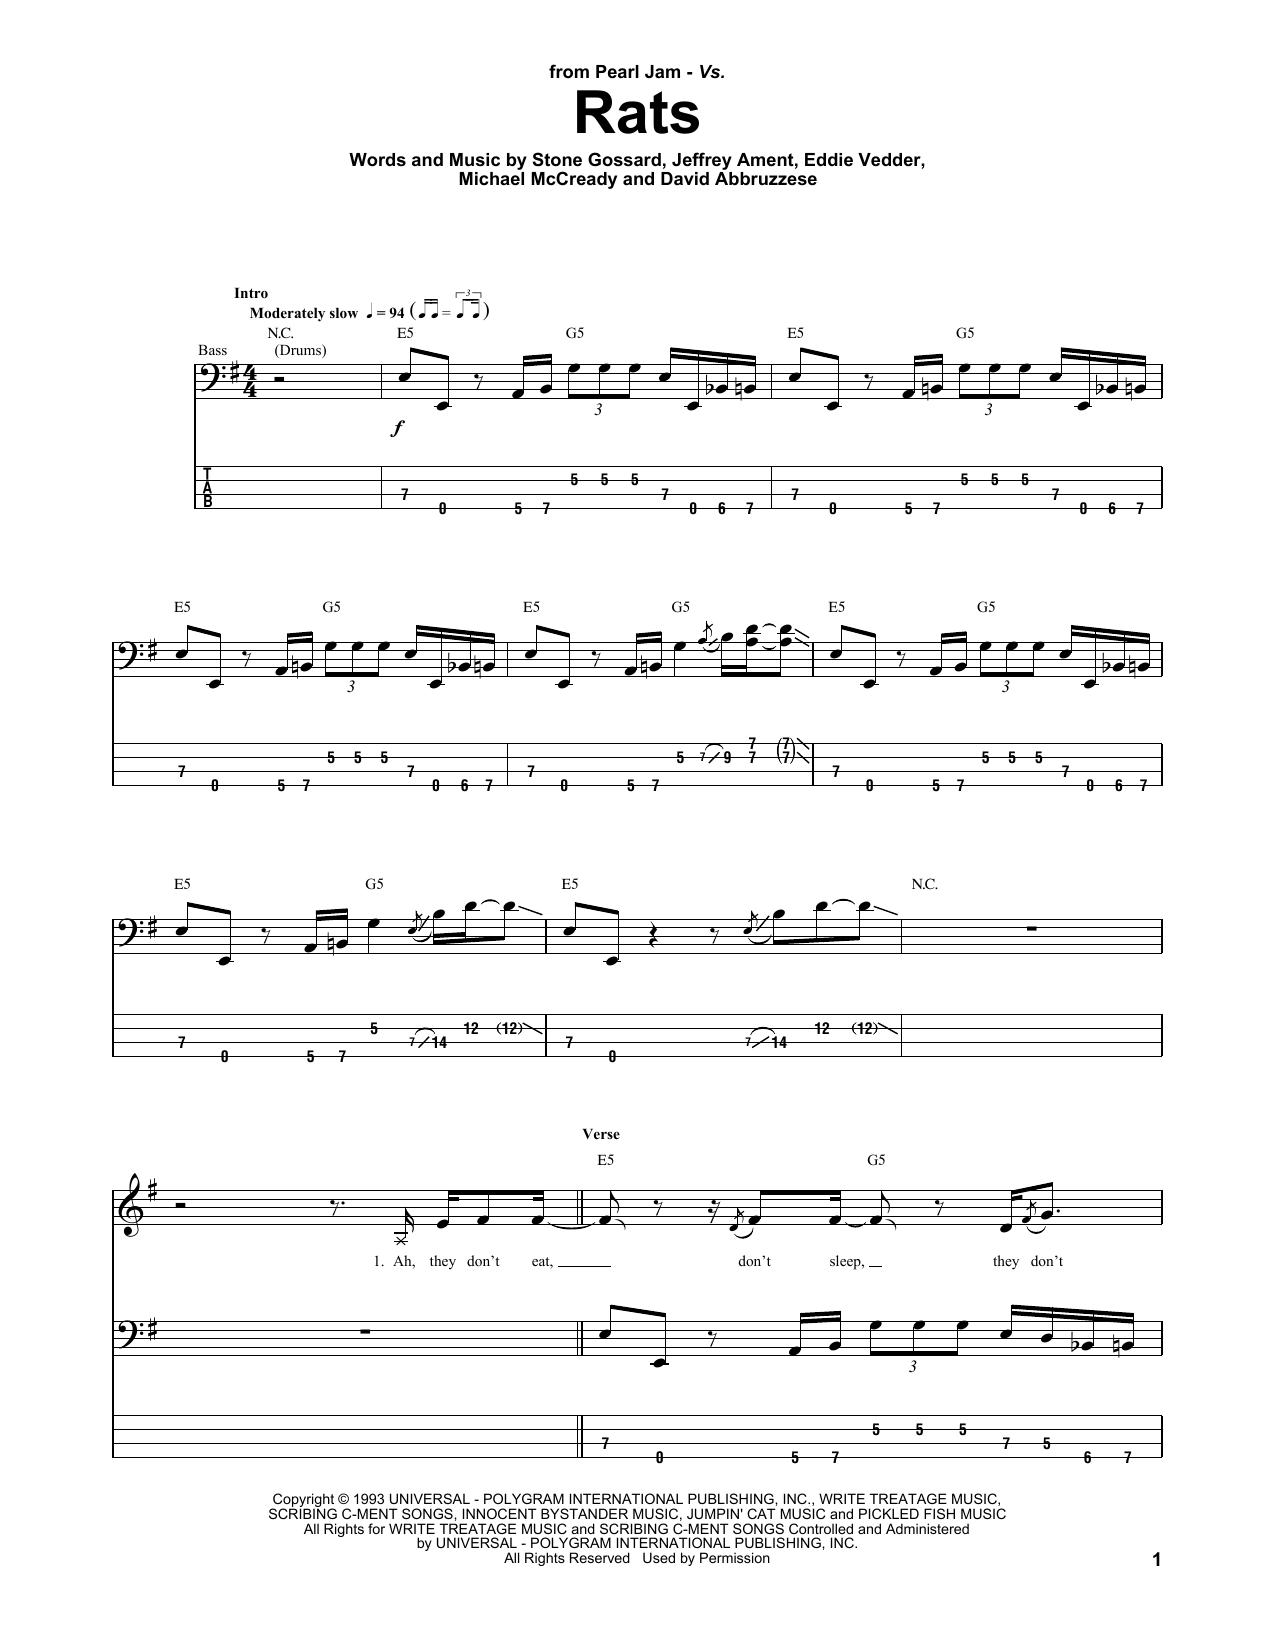 Tablature guitare Rats de Pearl Jam - Tablature Basse